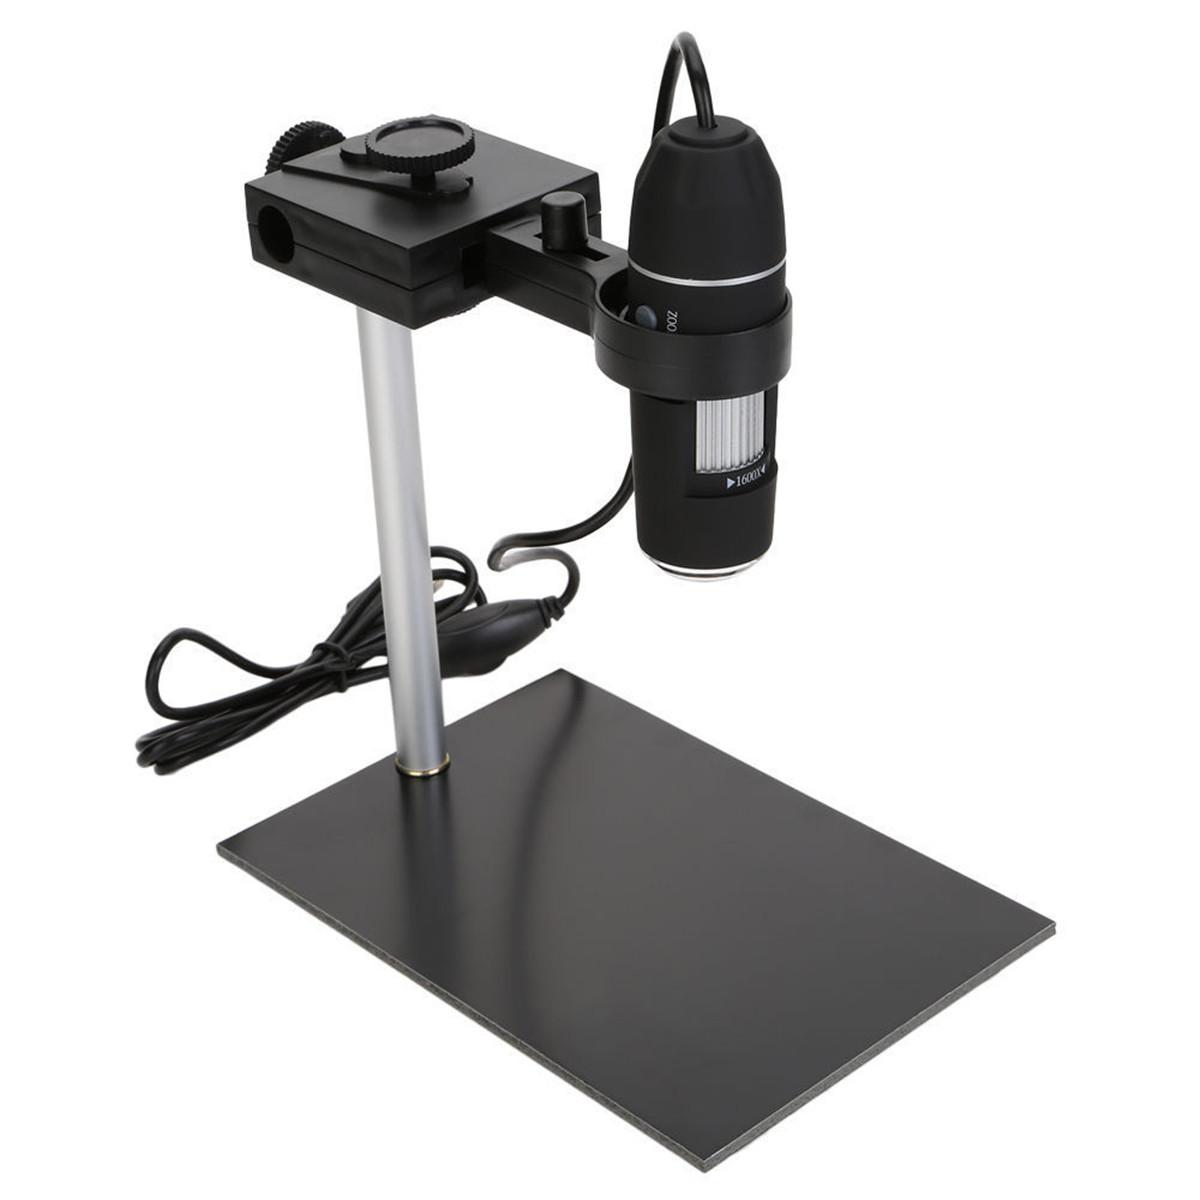 1600X USB цифровой микроскоп 8 LED Лупа с регулируемой подставкой